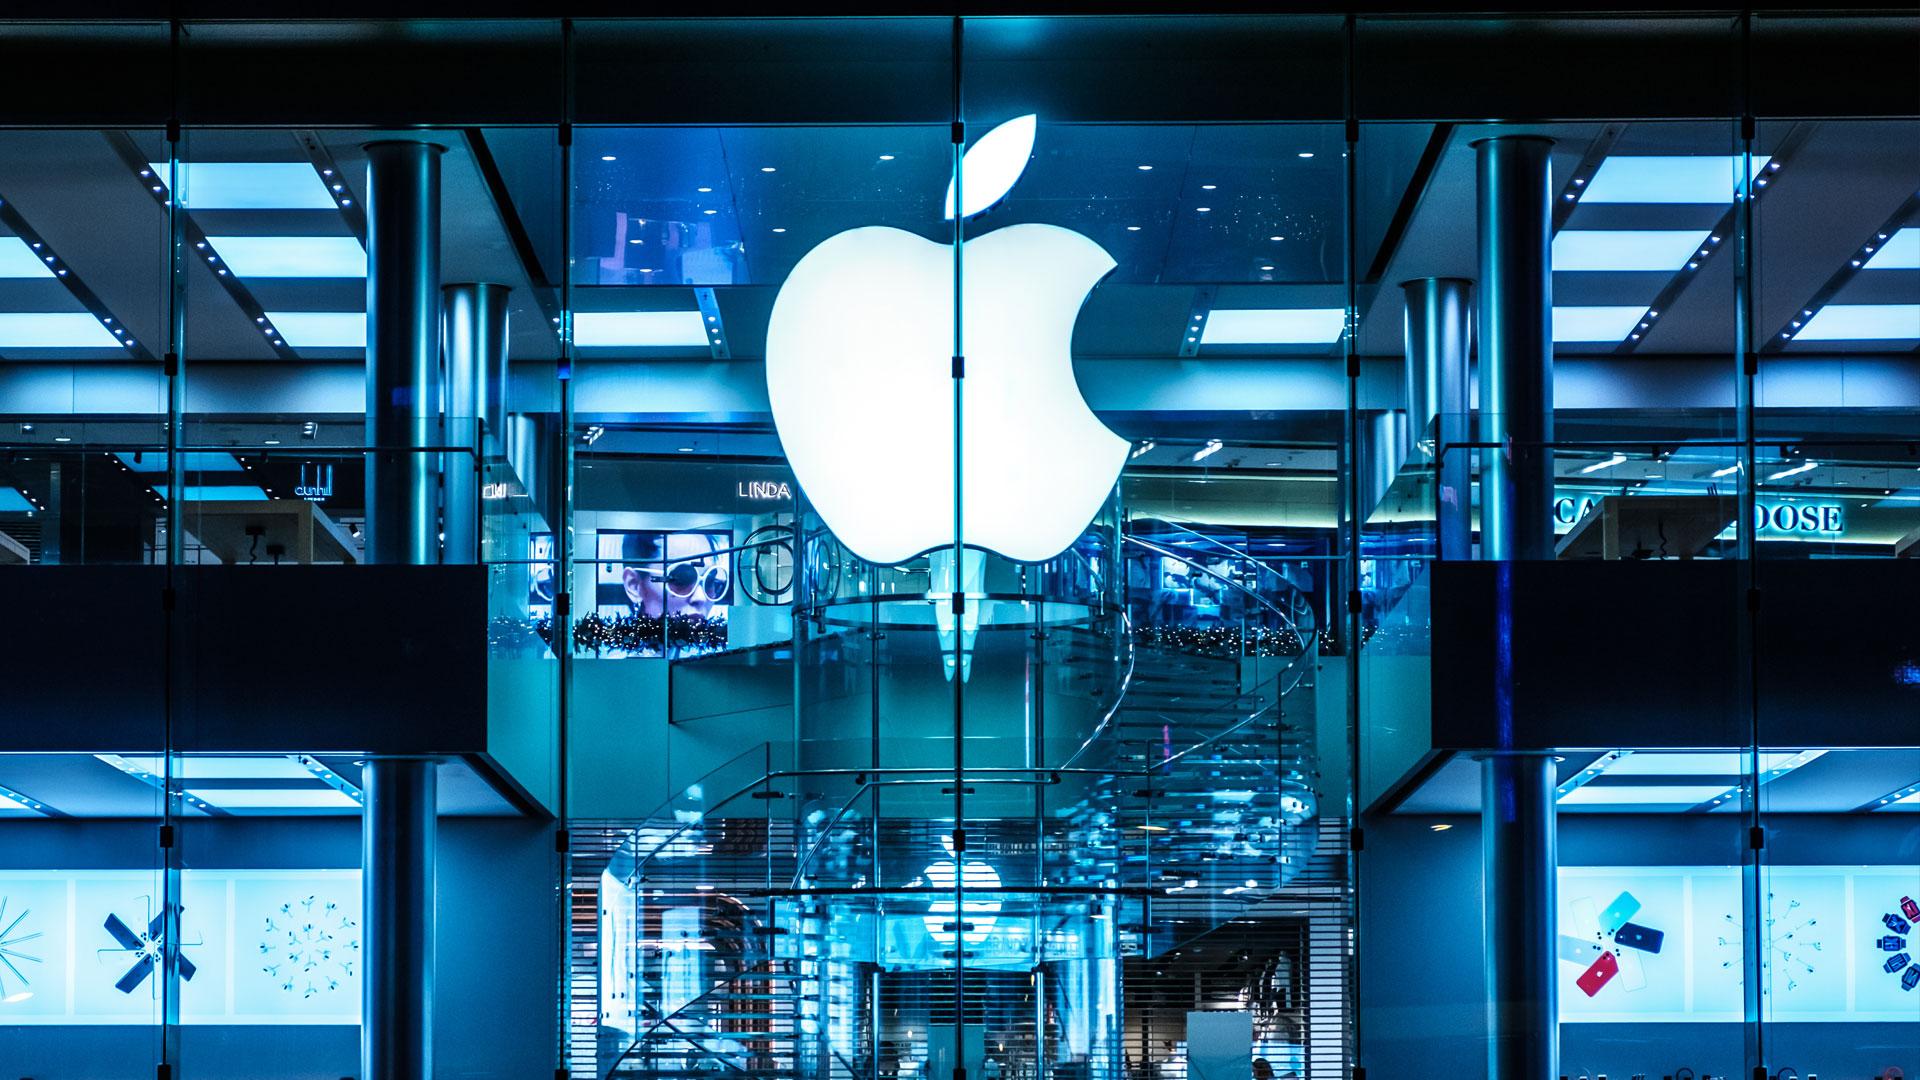 Apple: A Marketing Retrospective